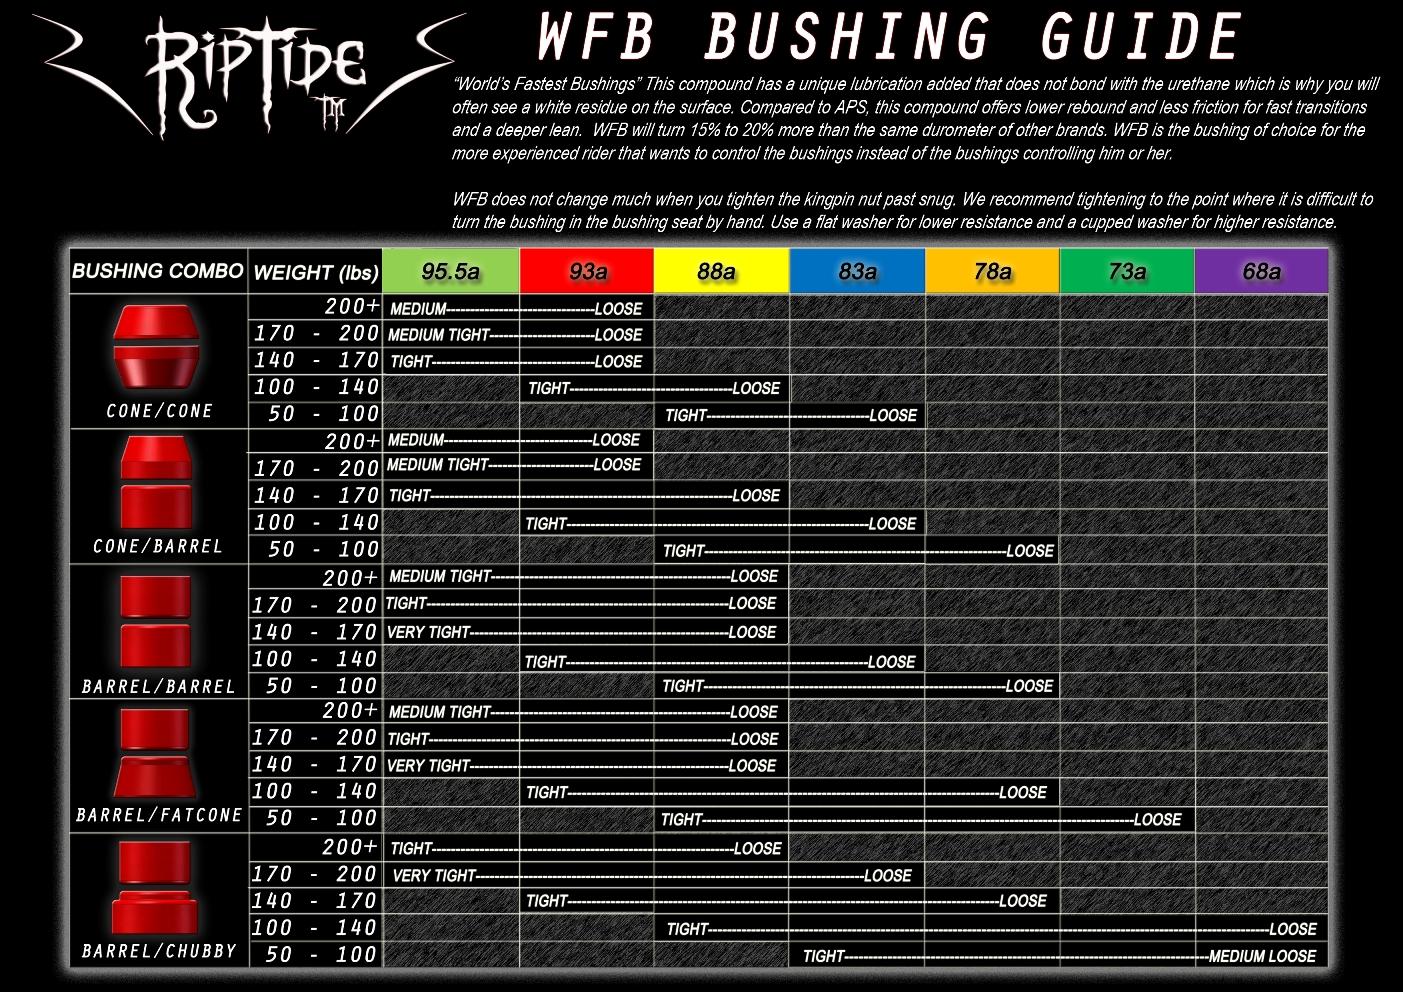 riptide-bushings-wfb-bushing-weight-chart-in-lbs-i.jpg